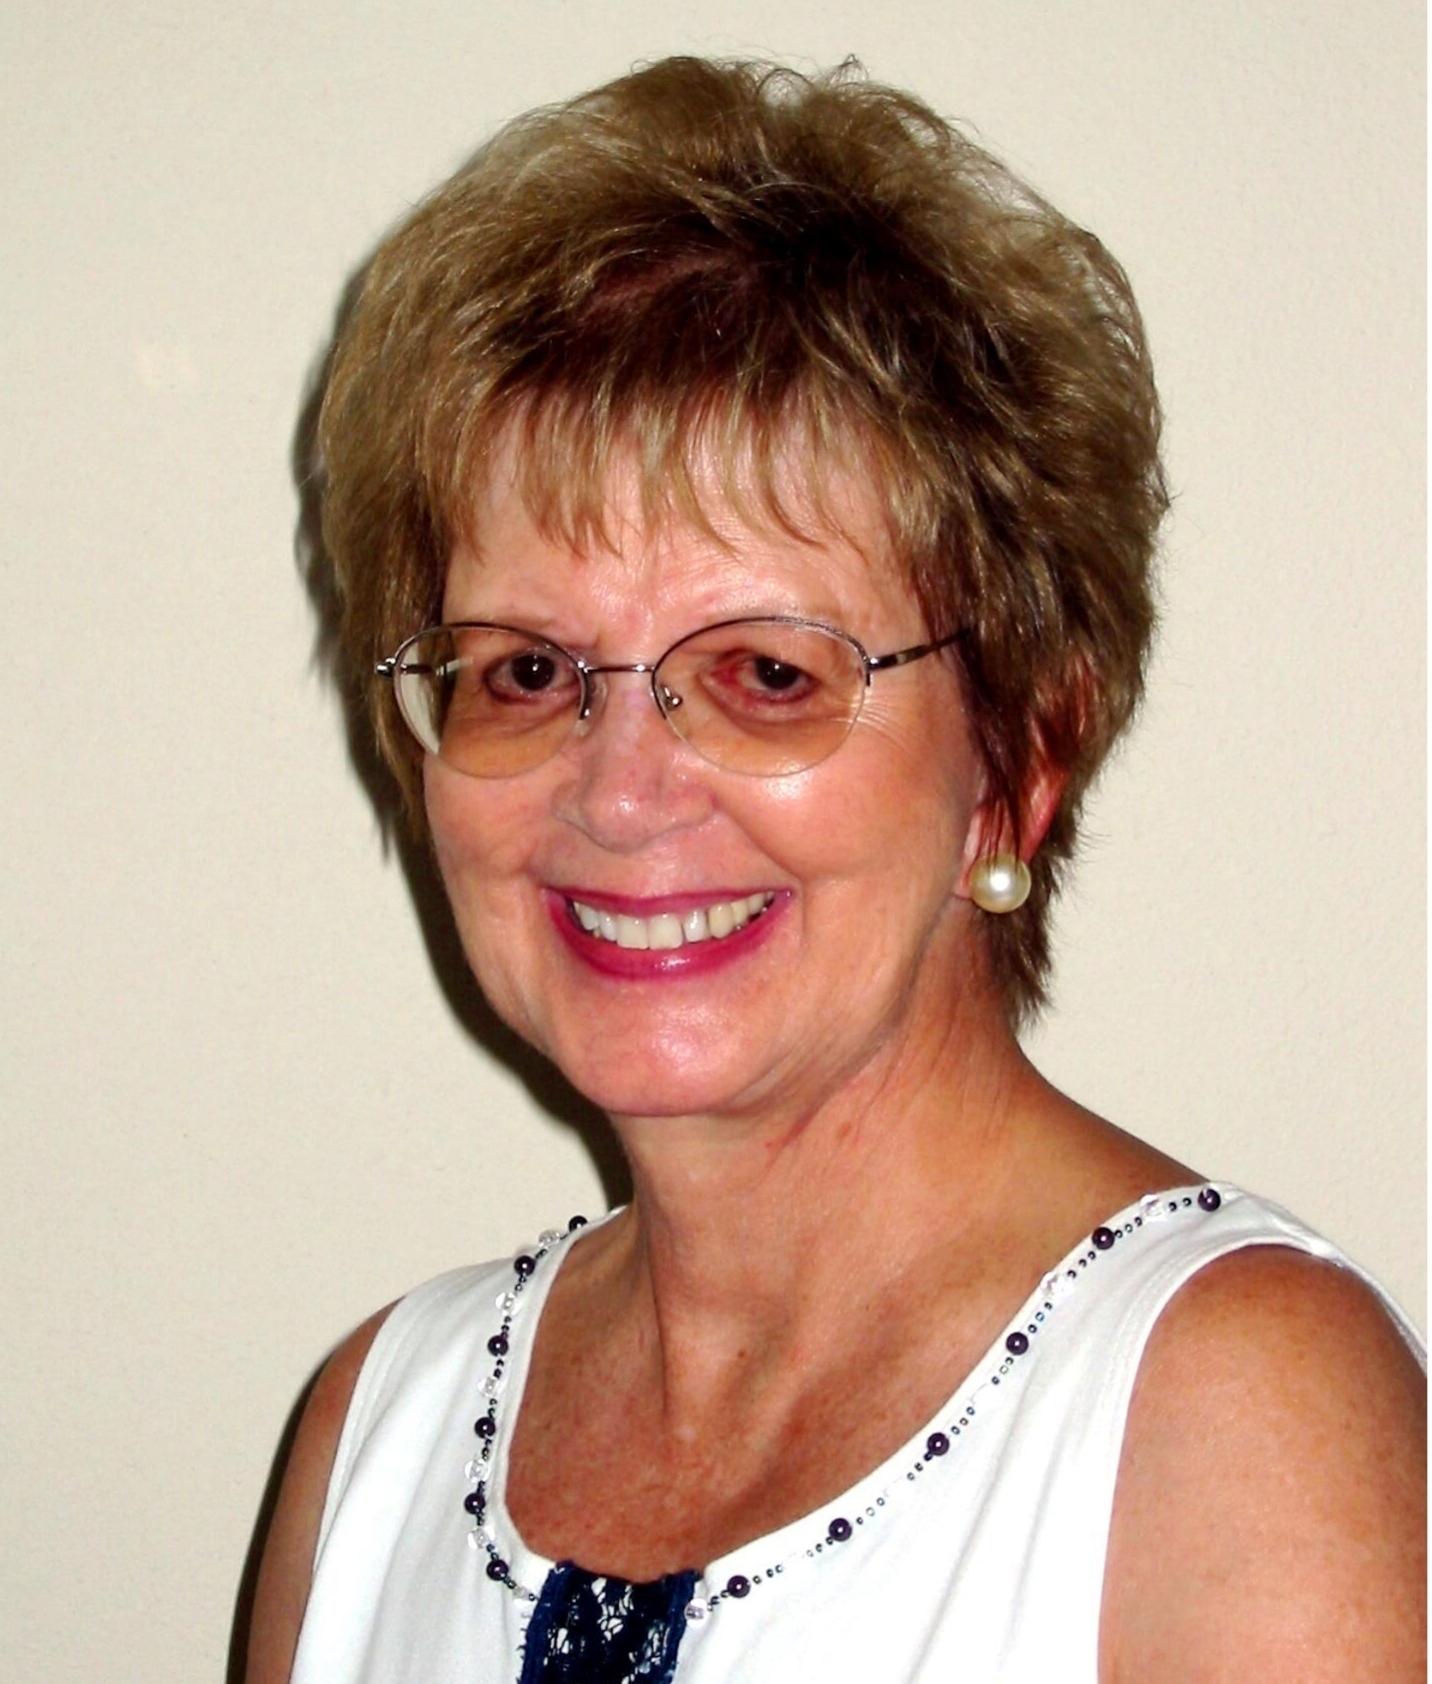 Janete Lee Howes